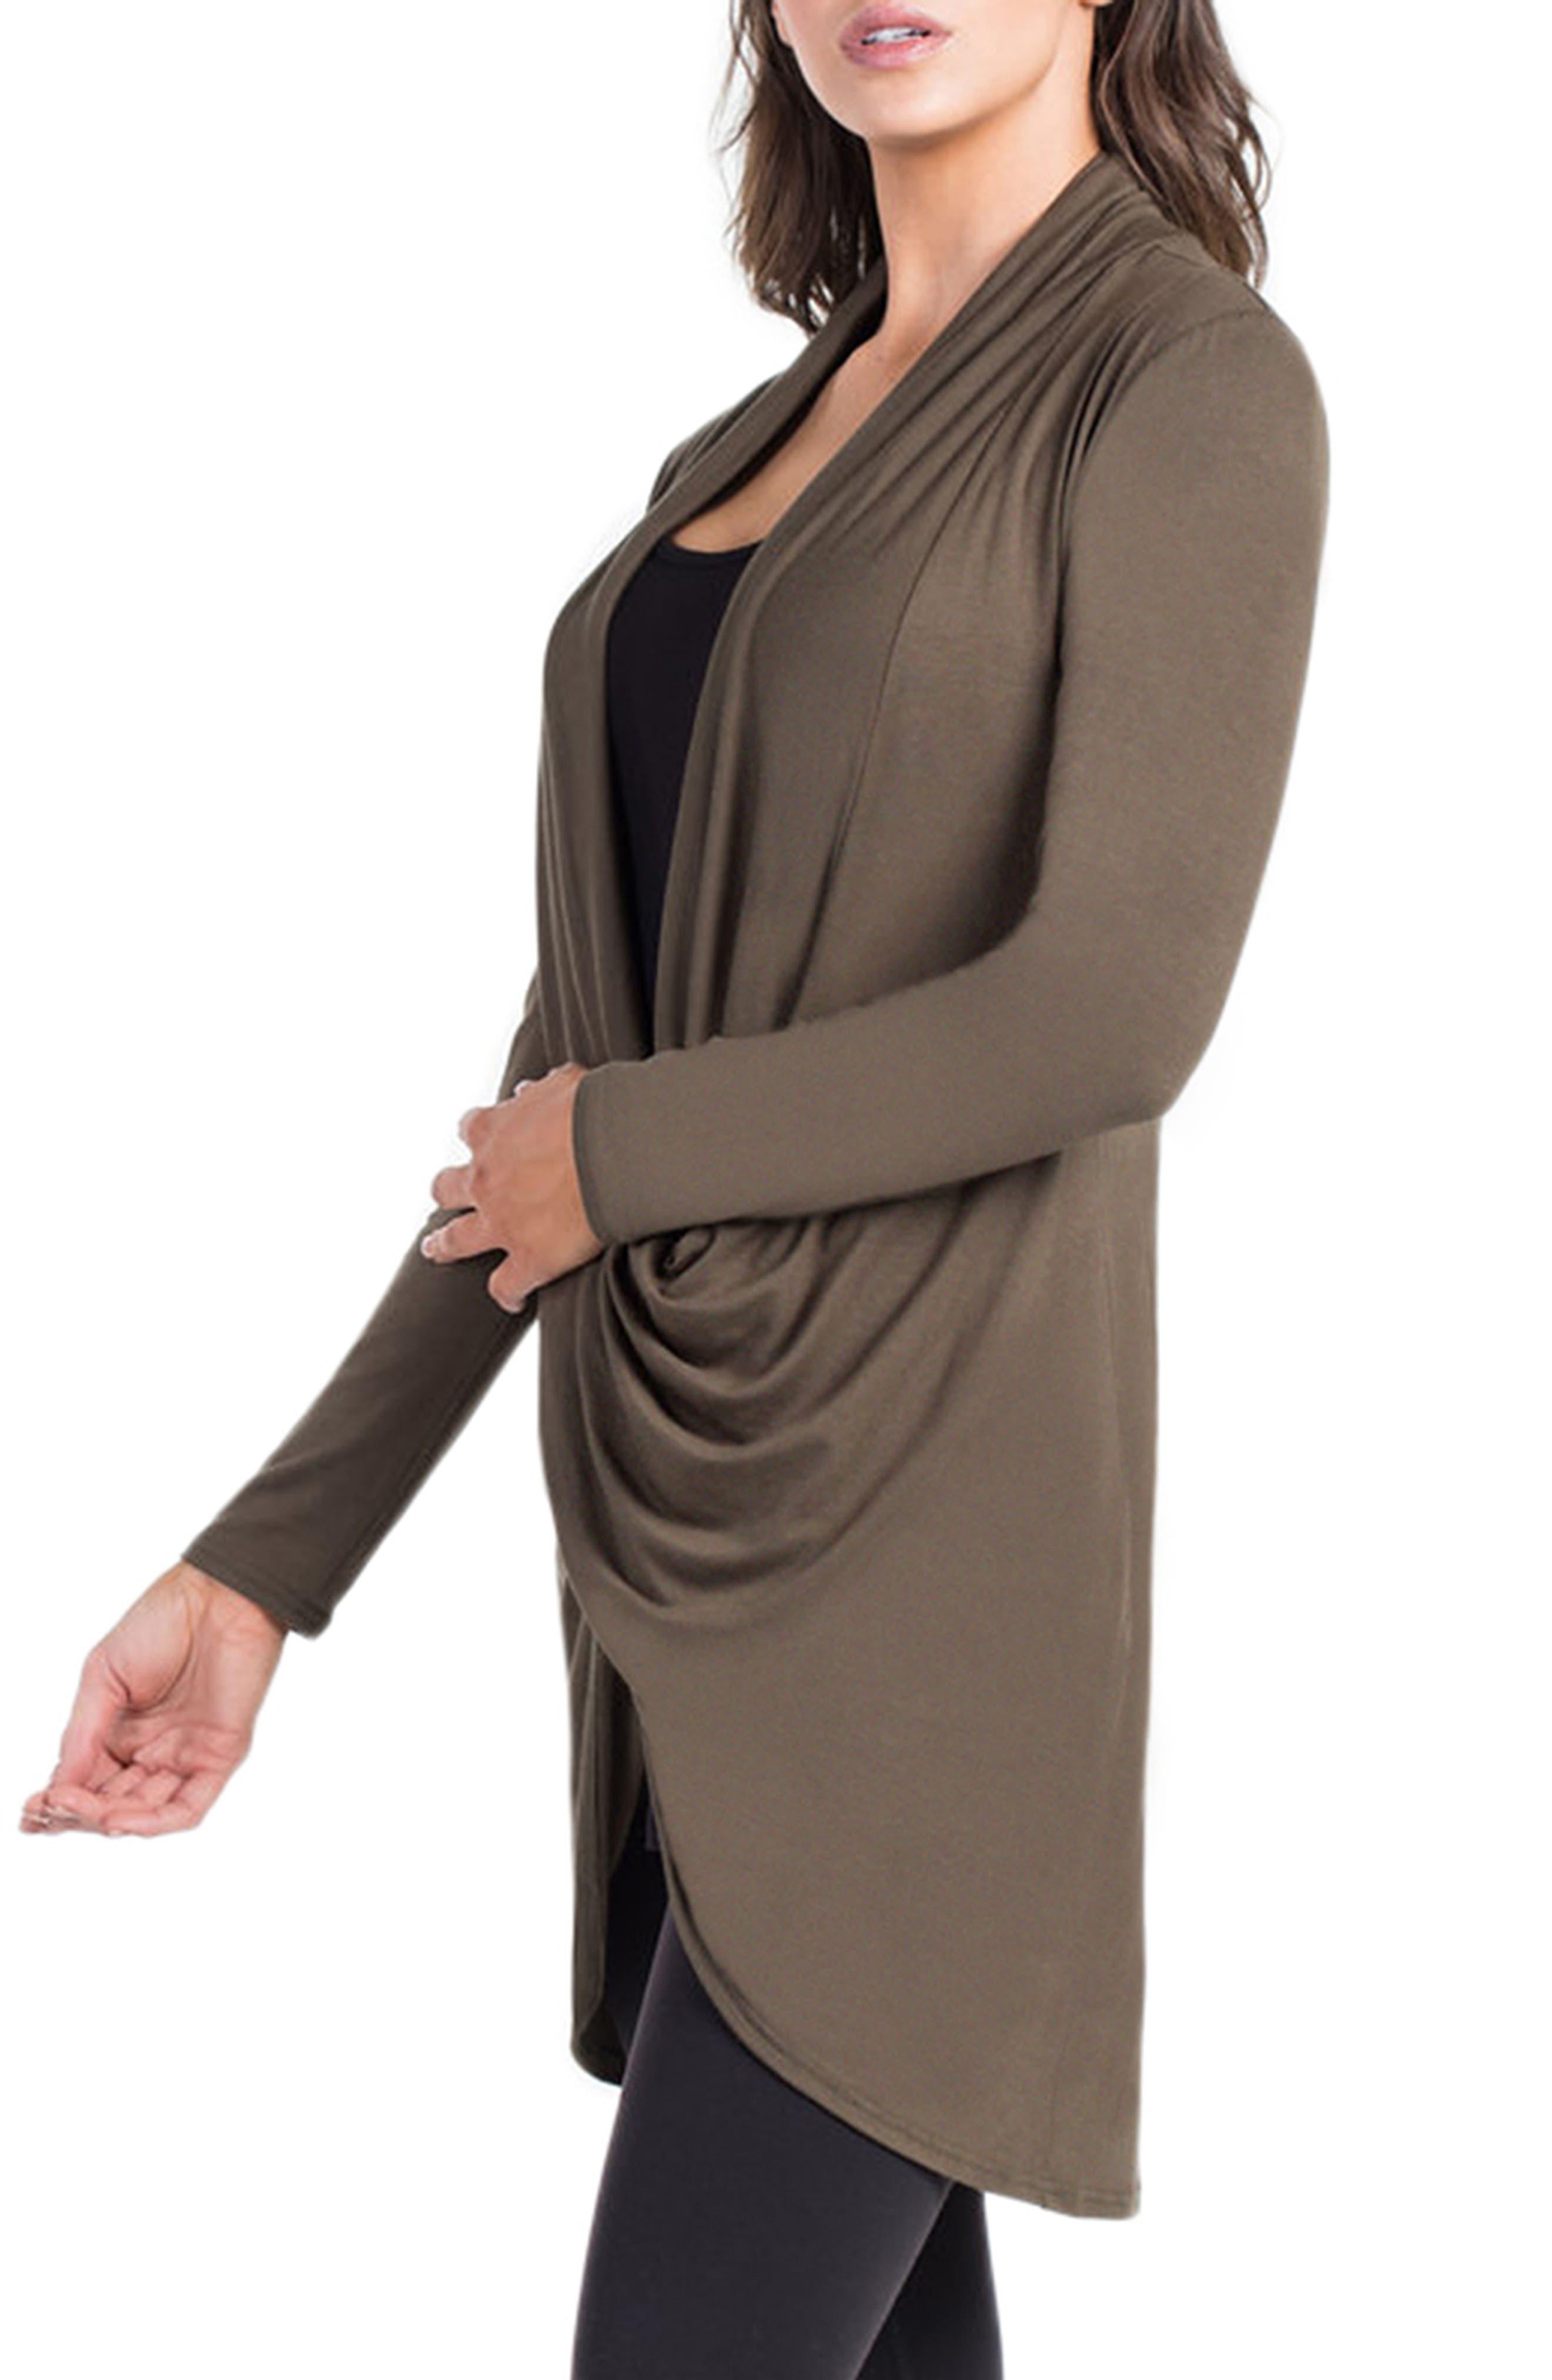 Nara Crossover Maternity/Nursing Tunic with Camisole,                             Alternate thumbnail 3, color,                             DARK OLIVE/ BLACK CAMI